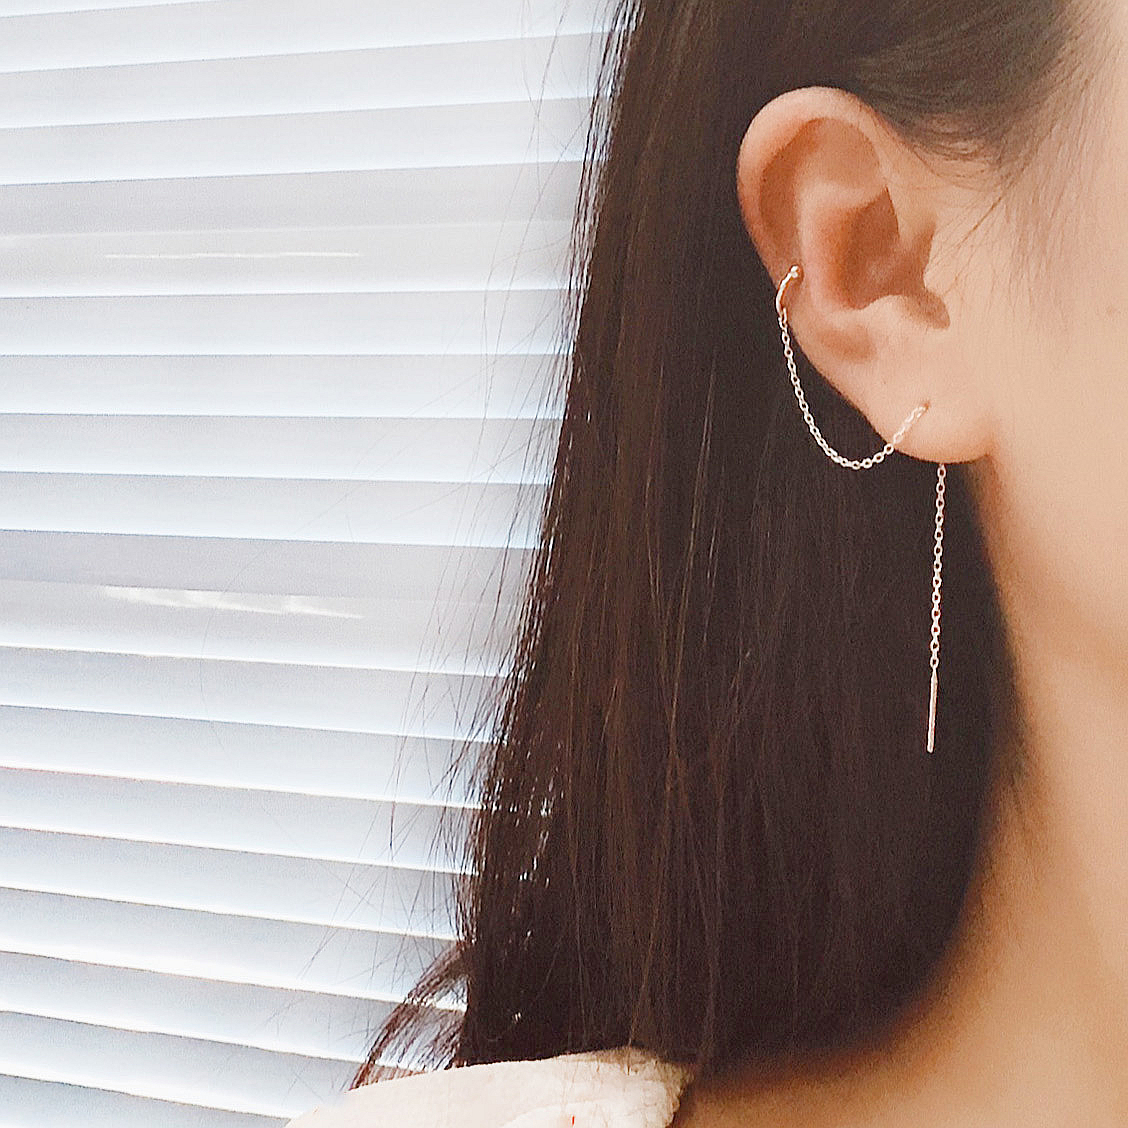 LISM 1 Pair Real 925 Sterling Silver Earrings For Women Fashion Jewelry Long Tassel Ear Clips Ear Line Party Gifts